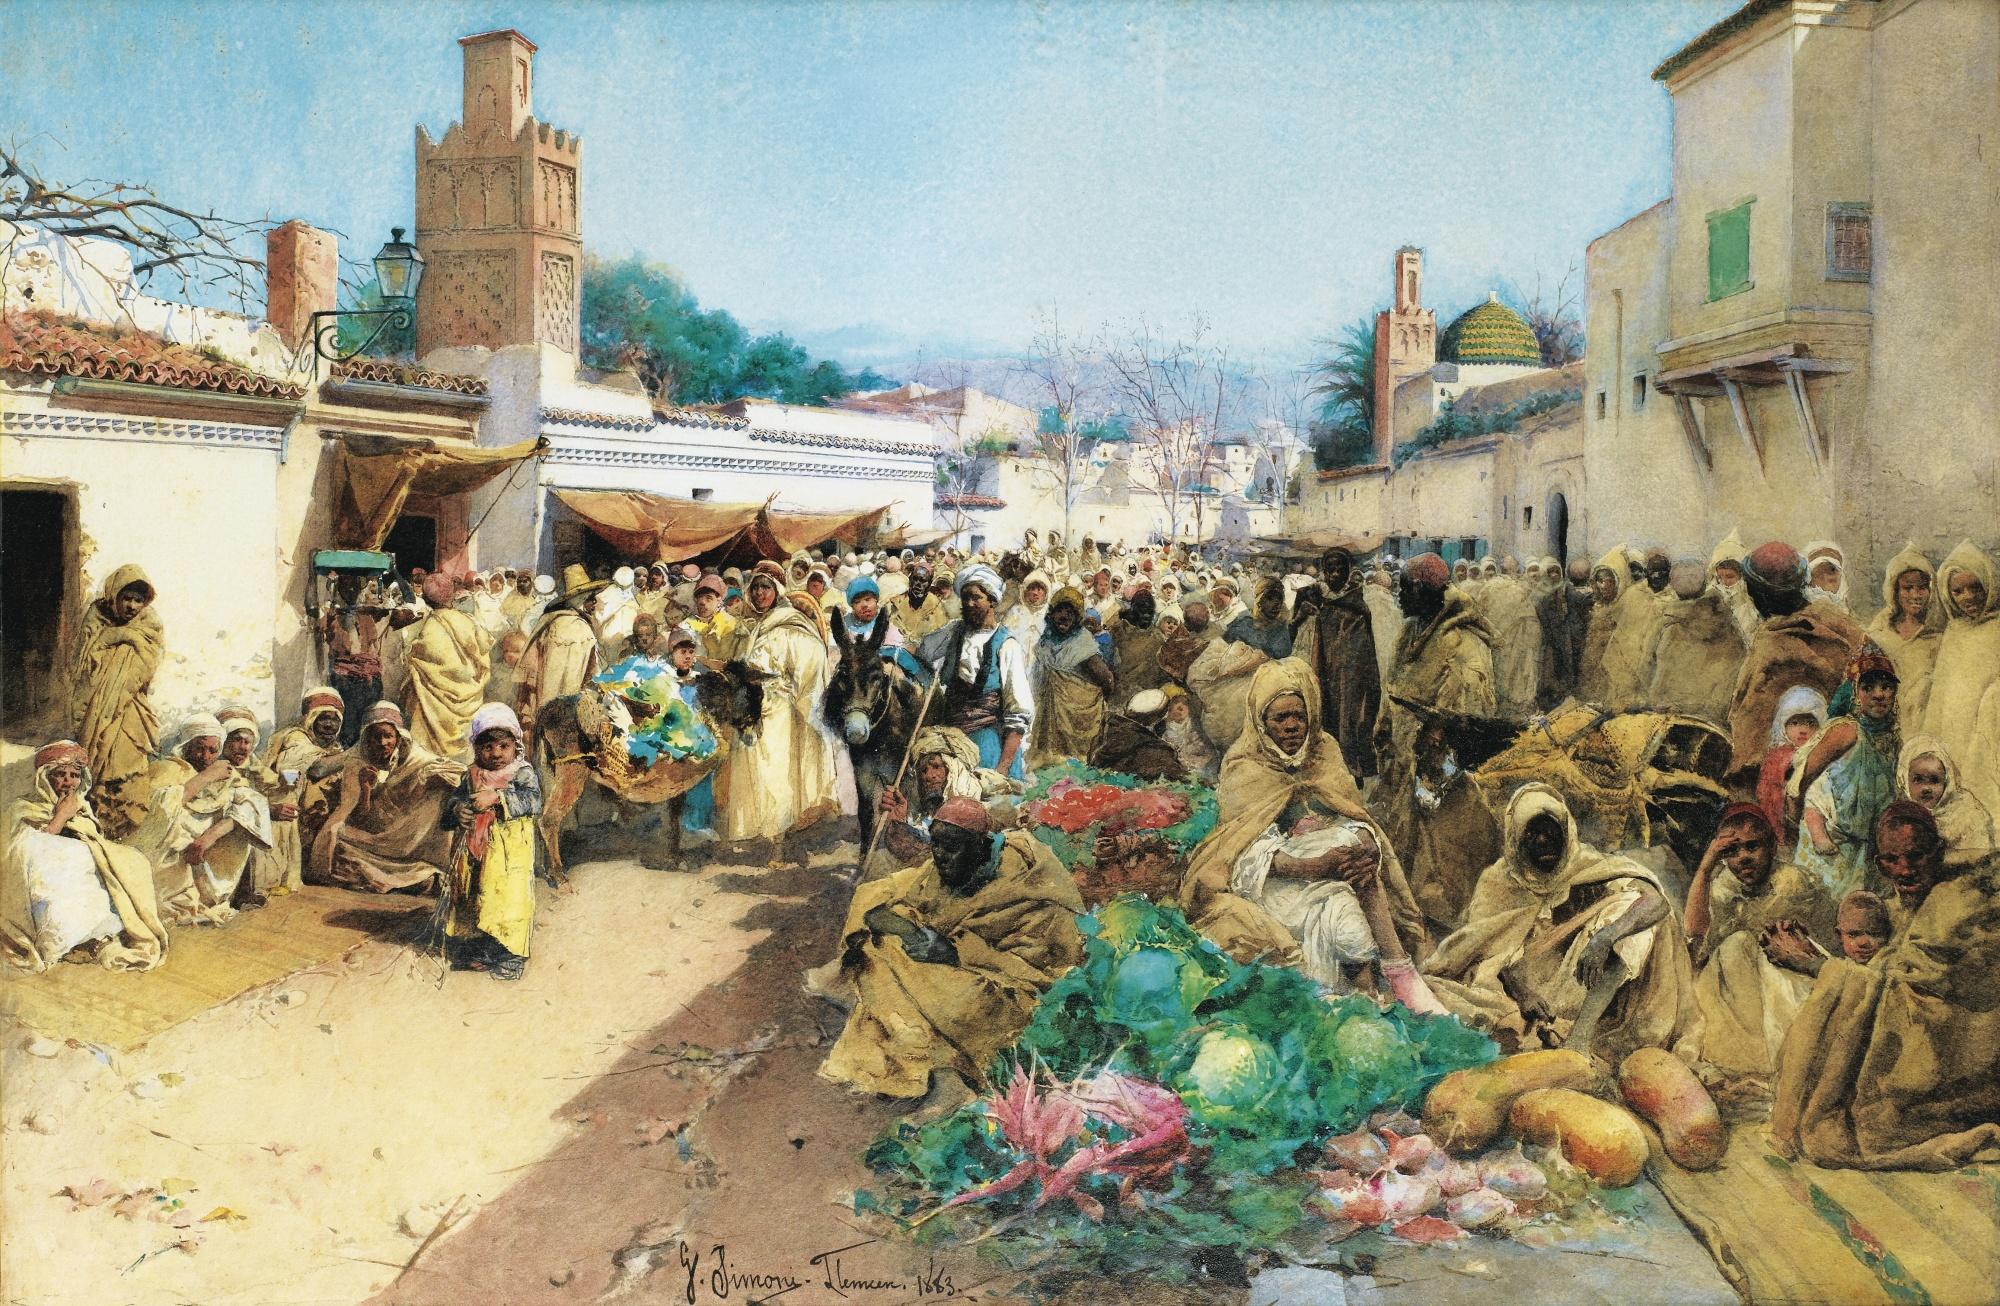 La cuisine de Tlemcen : une nature prodigieuse au service de sa cuisine (1/3)